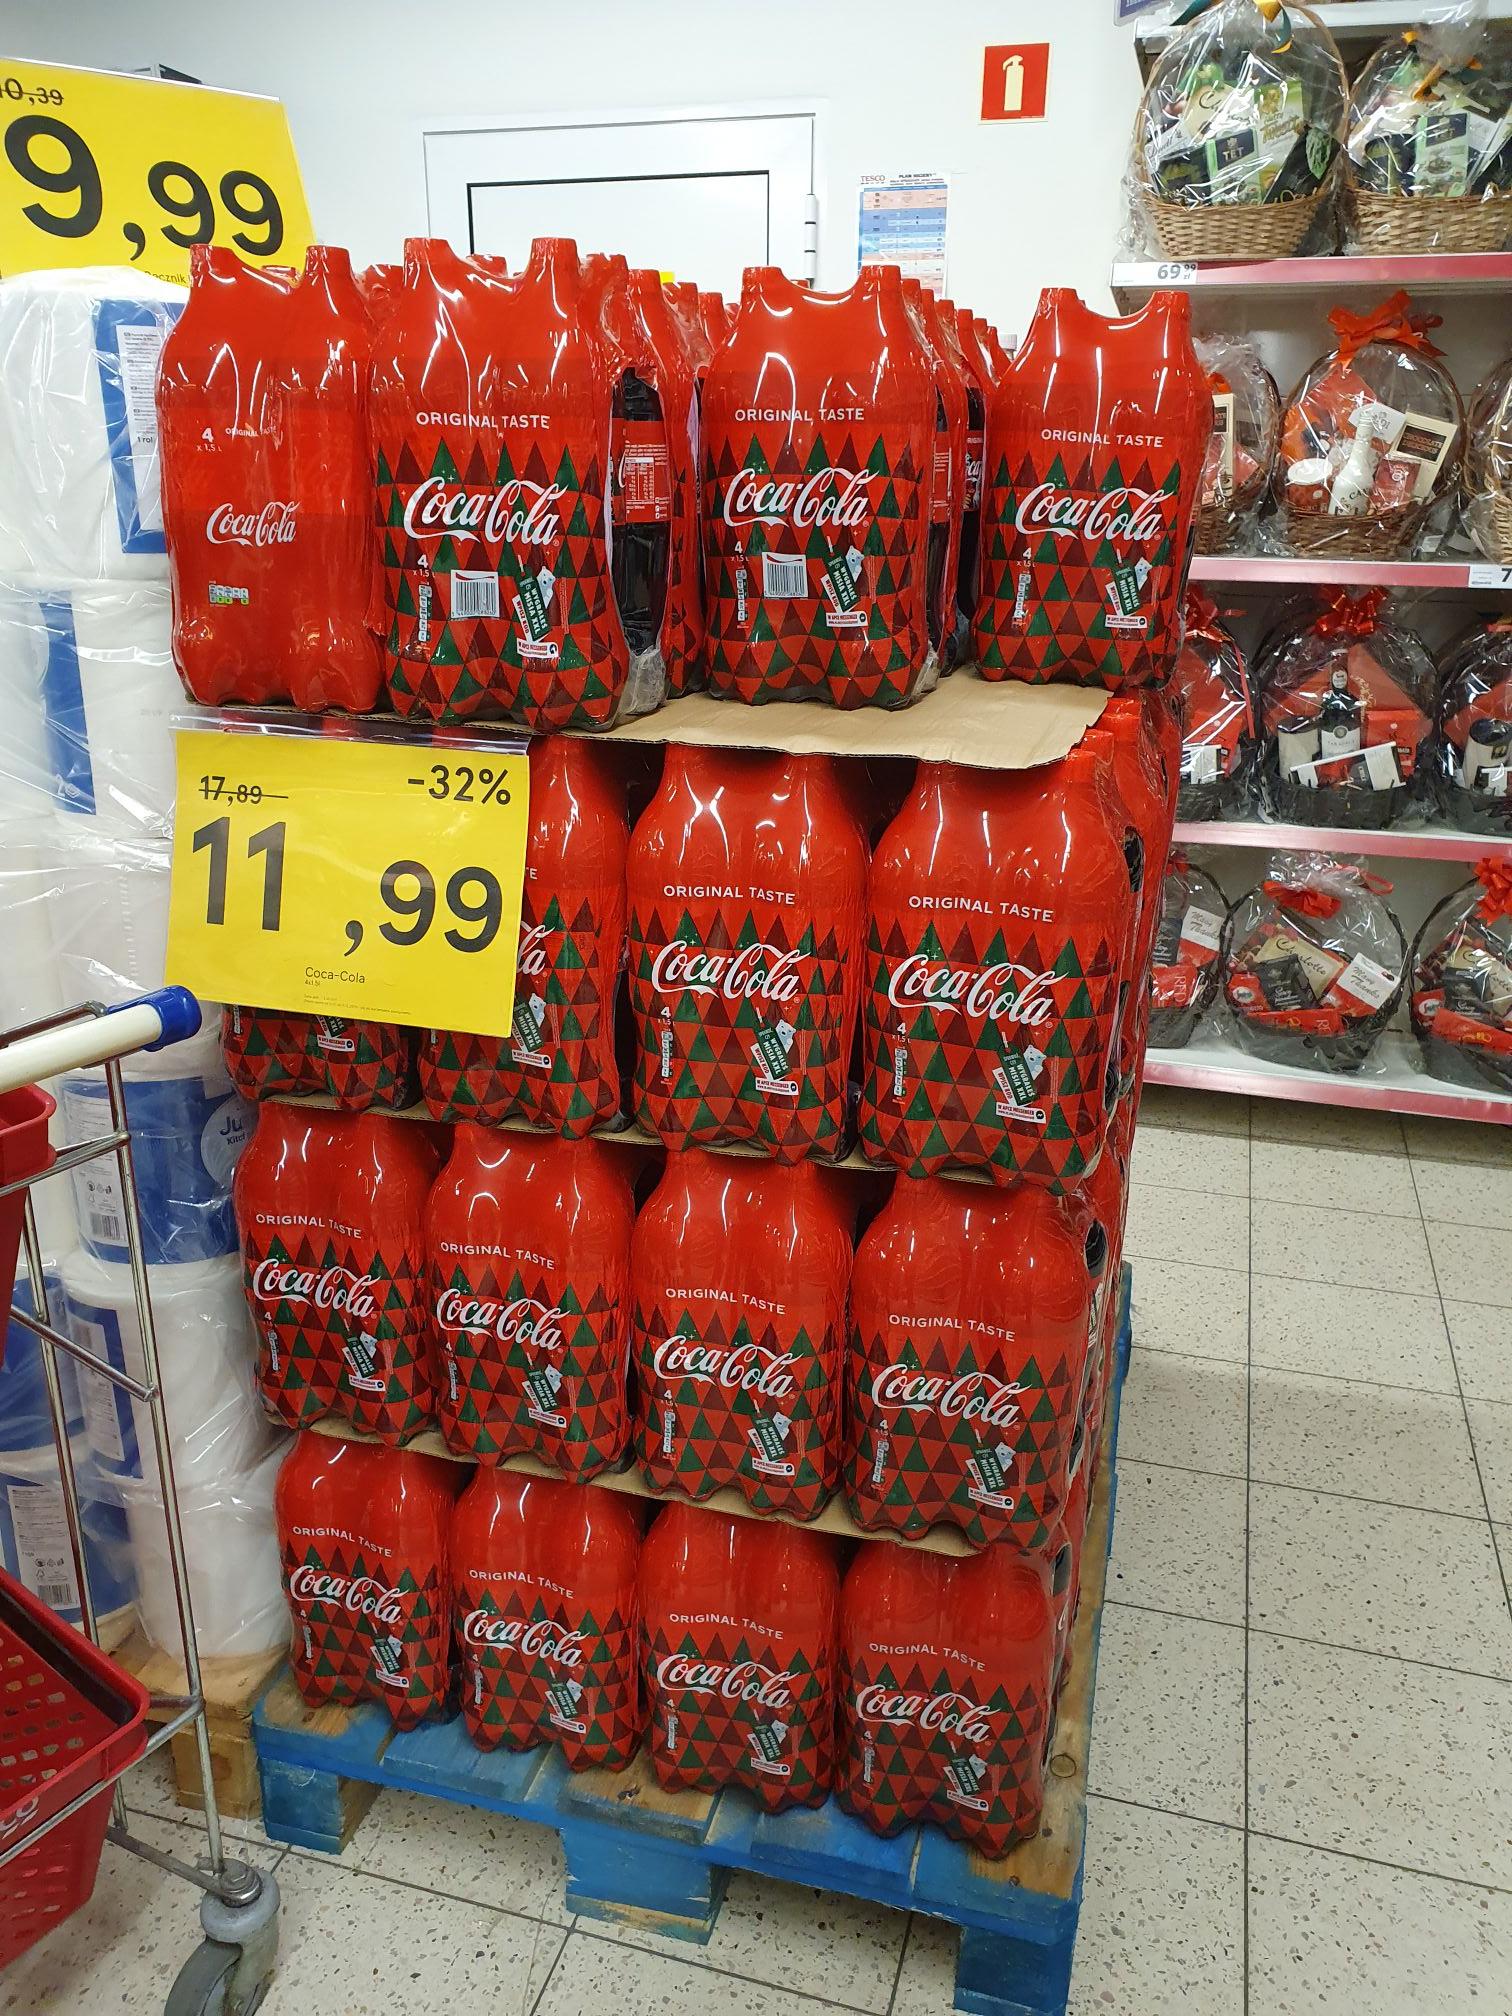 4-pak Coca-Cola, Tesco